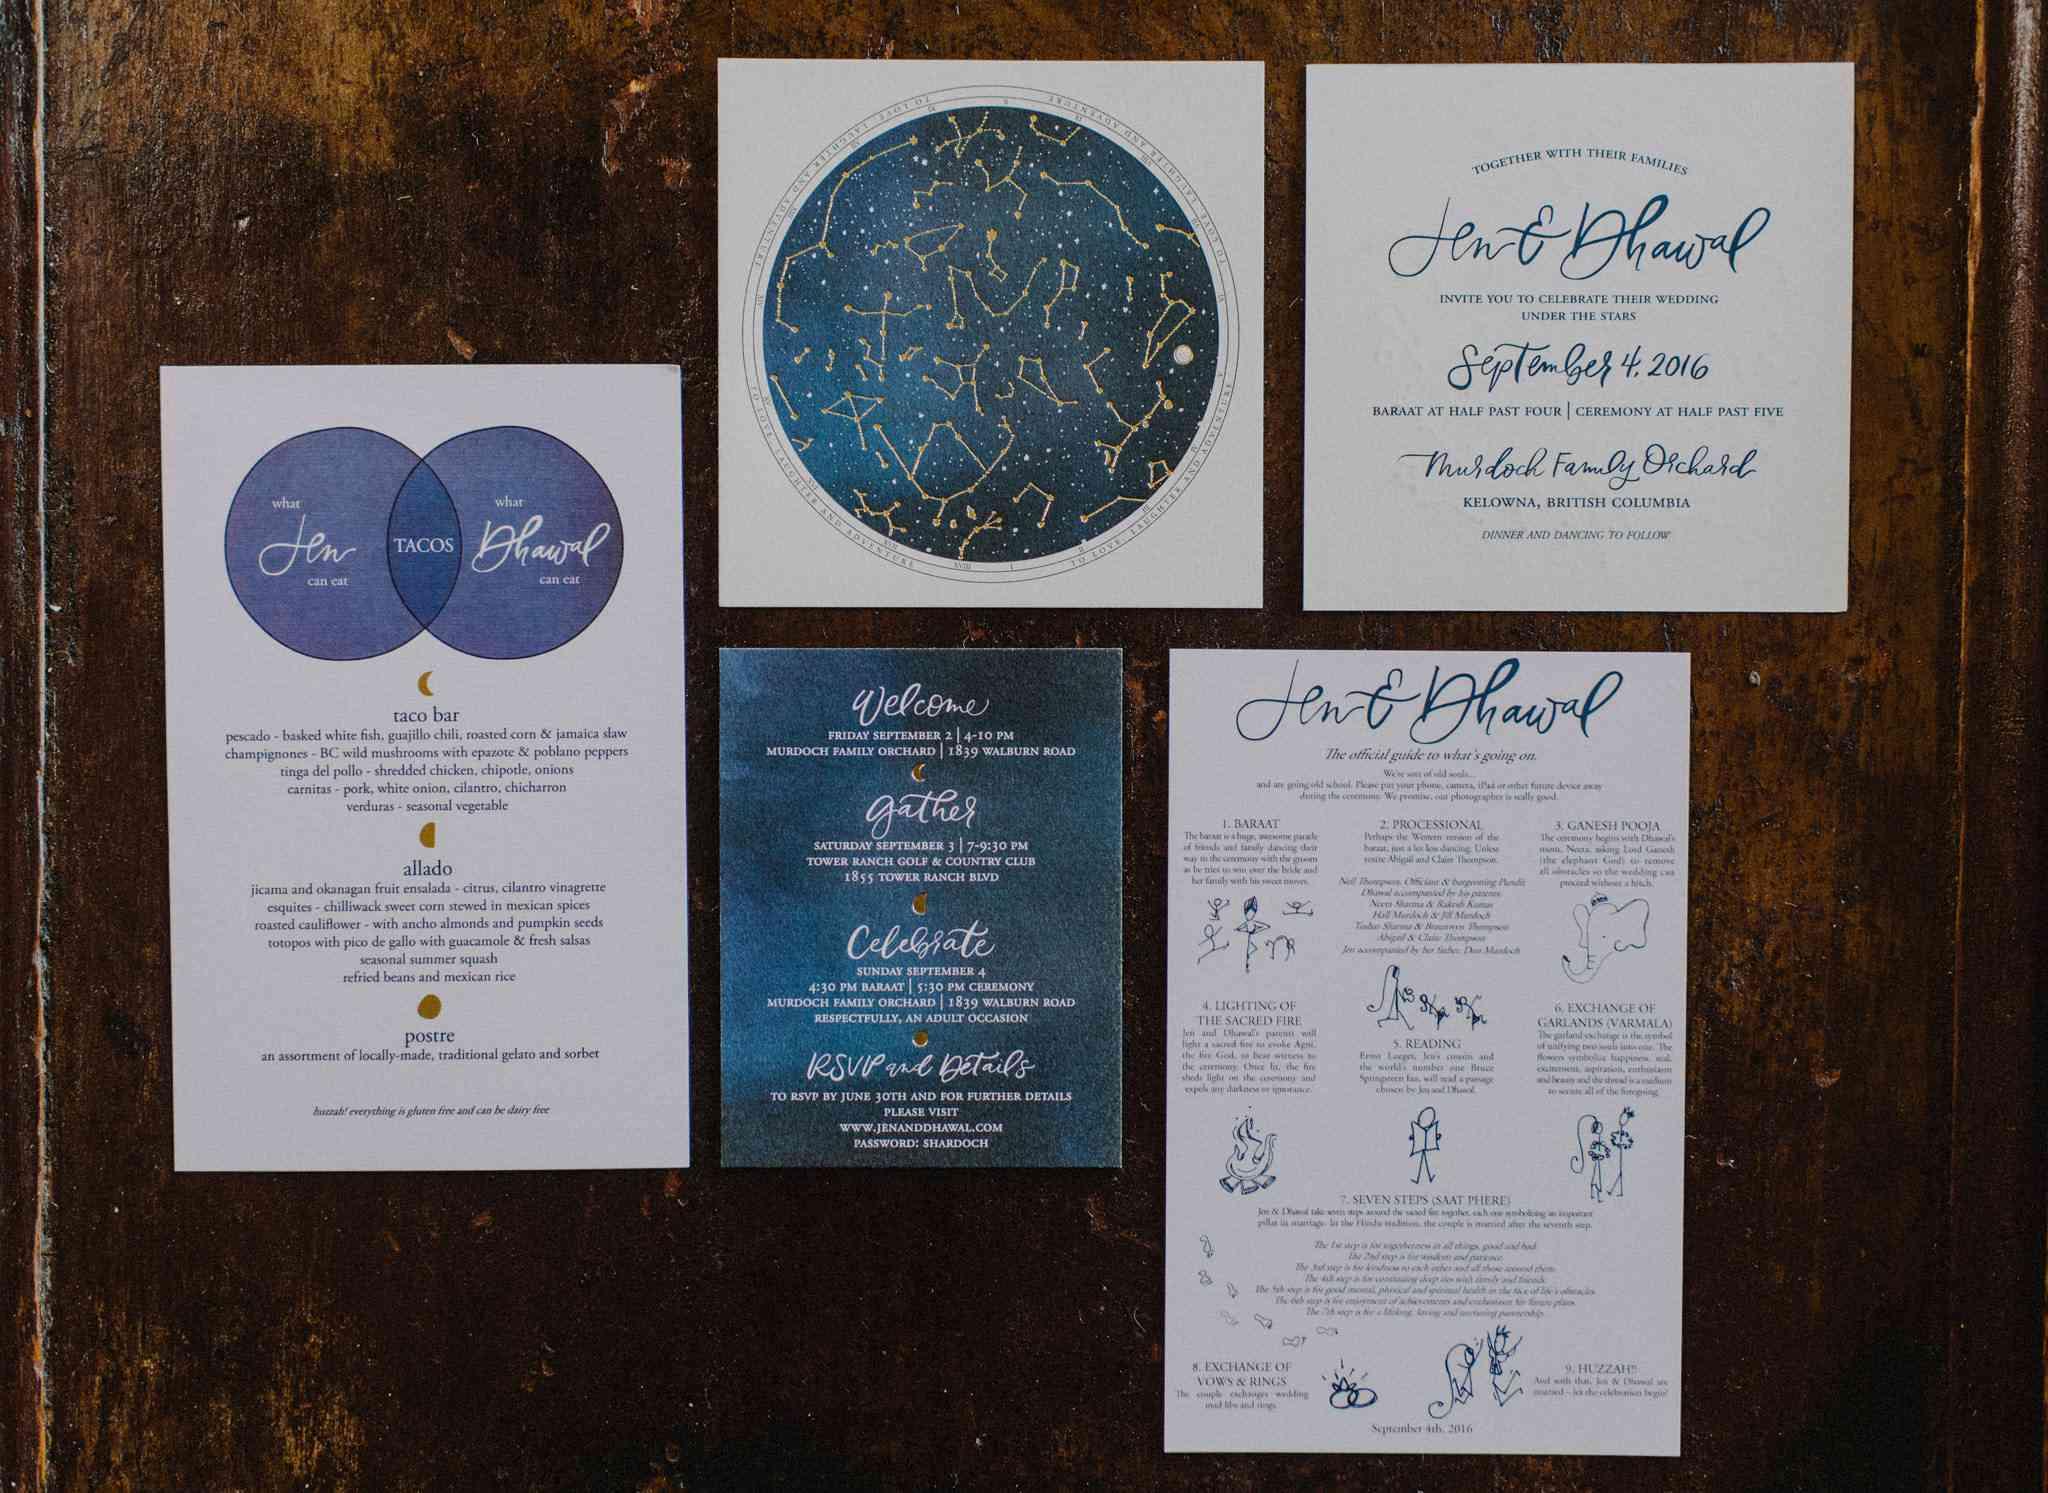 Constellation-inspired invites